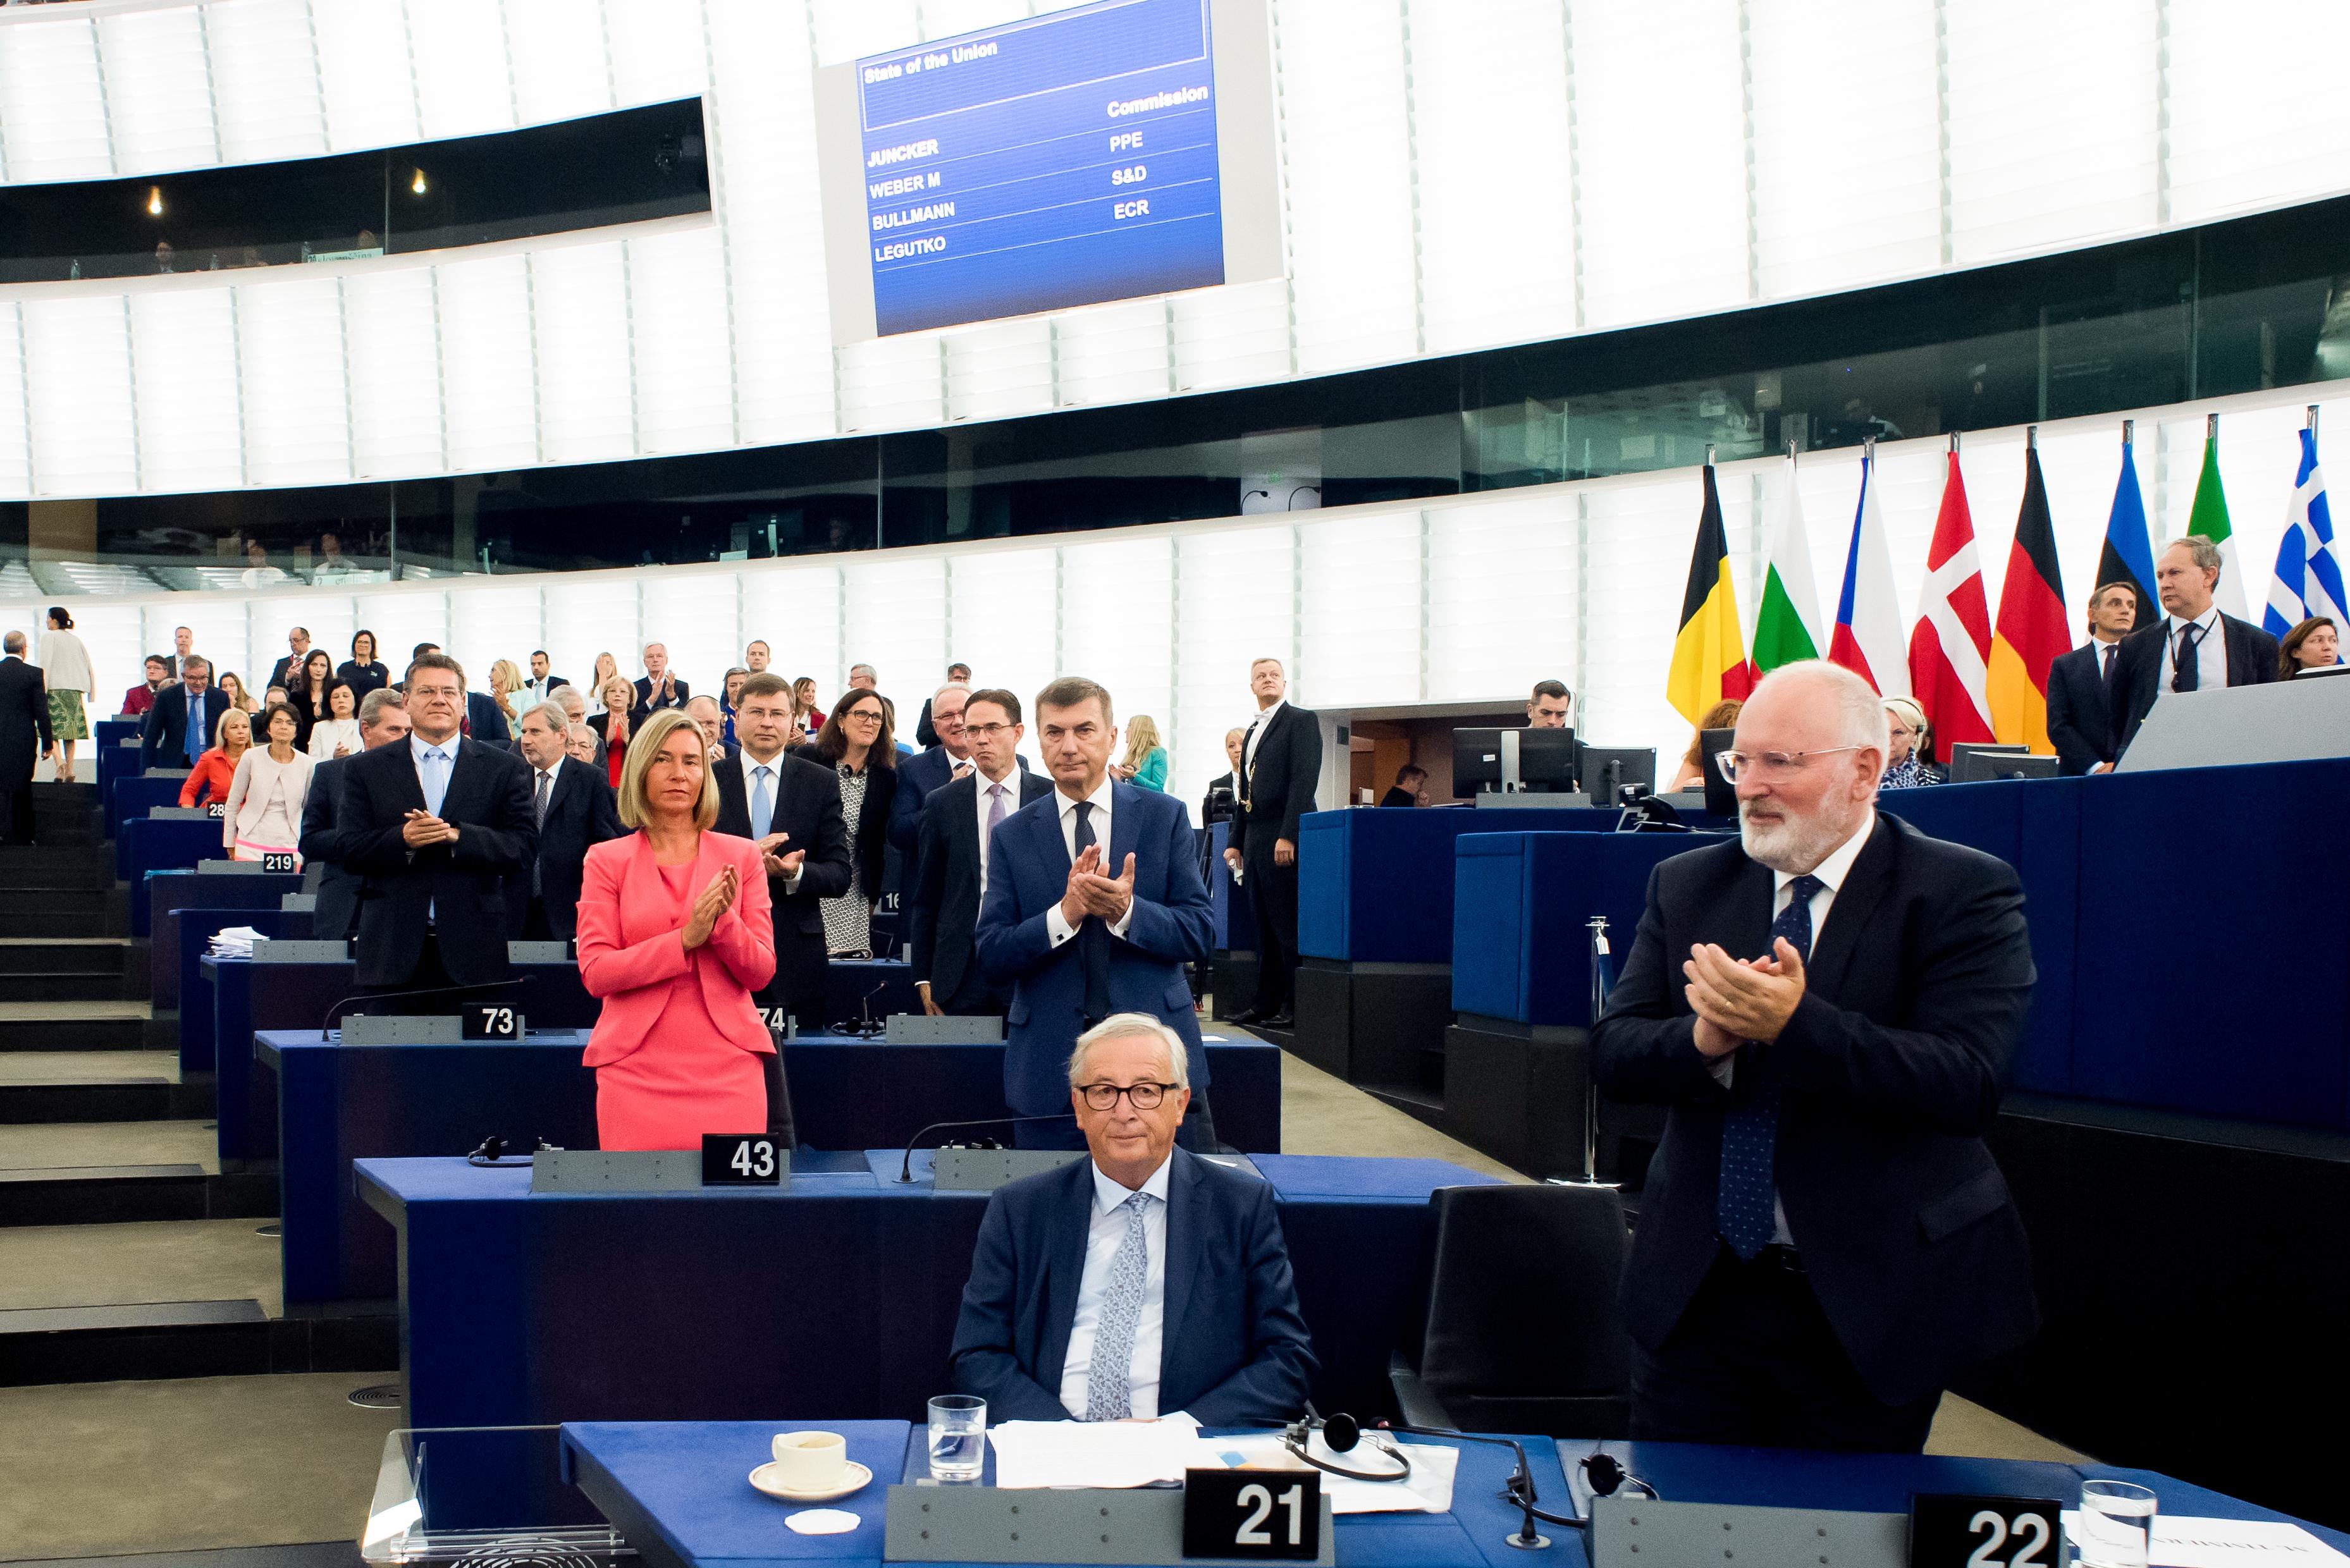 EU's 1-Hour Deadline To Social Media Websites To Remove Terror Propaganda